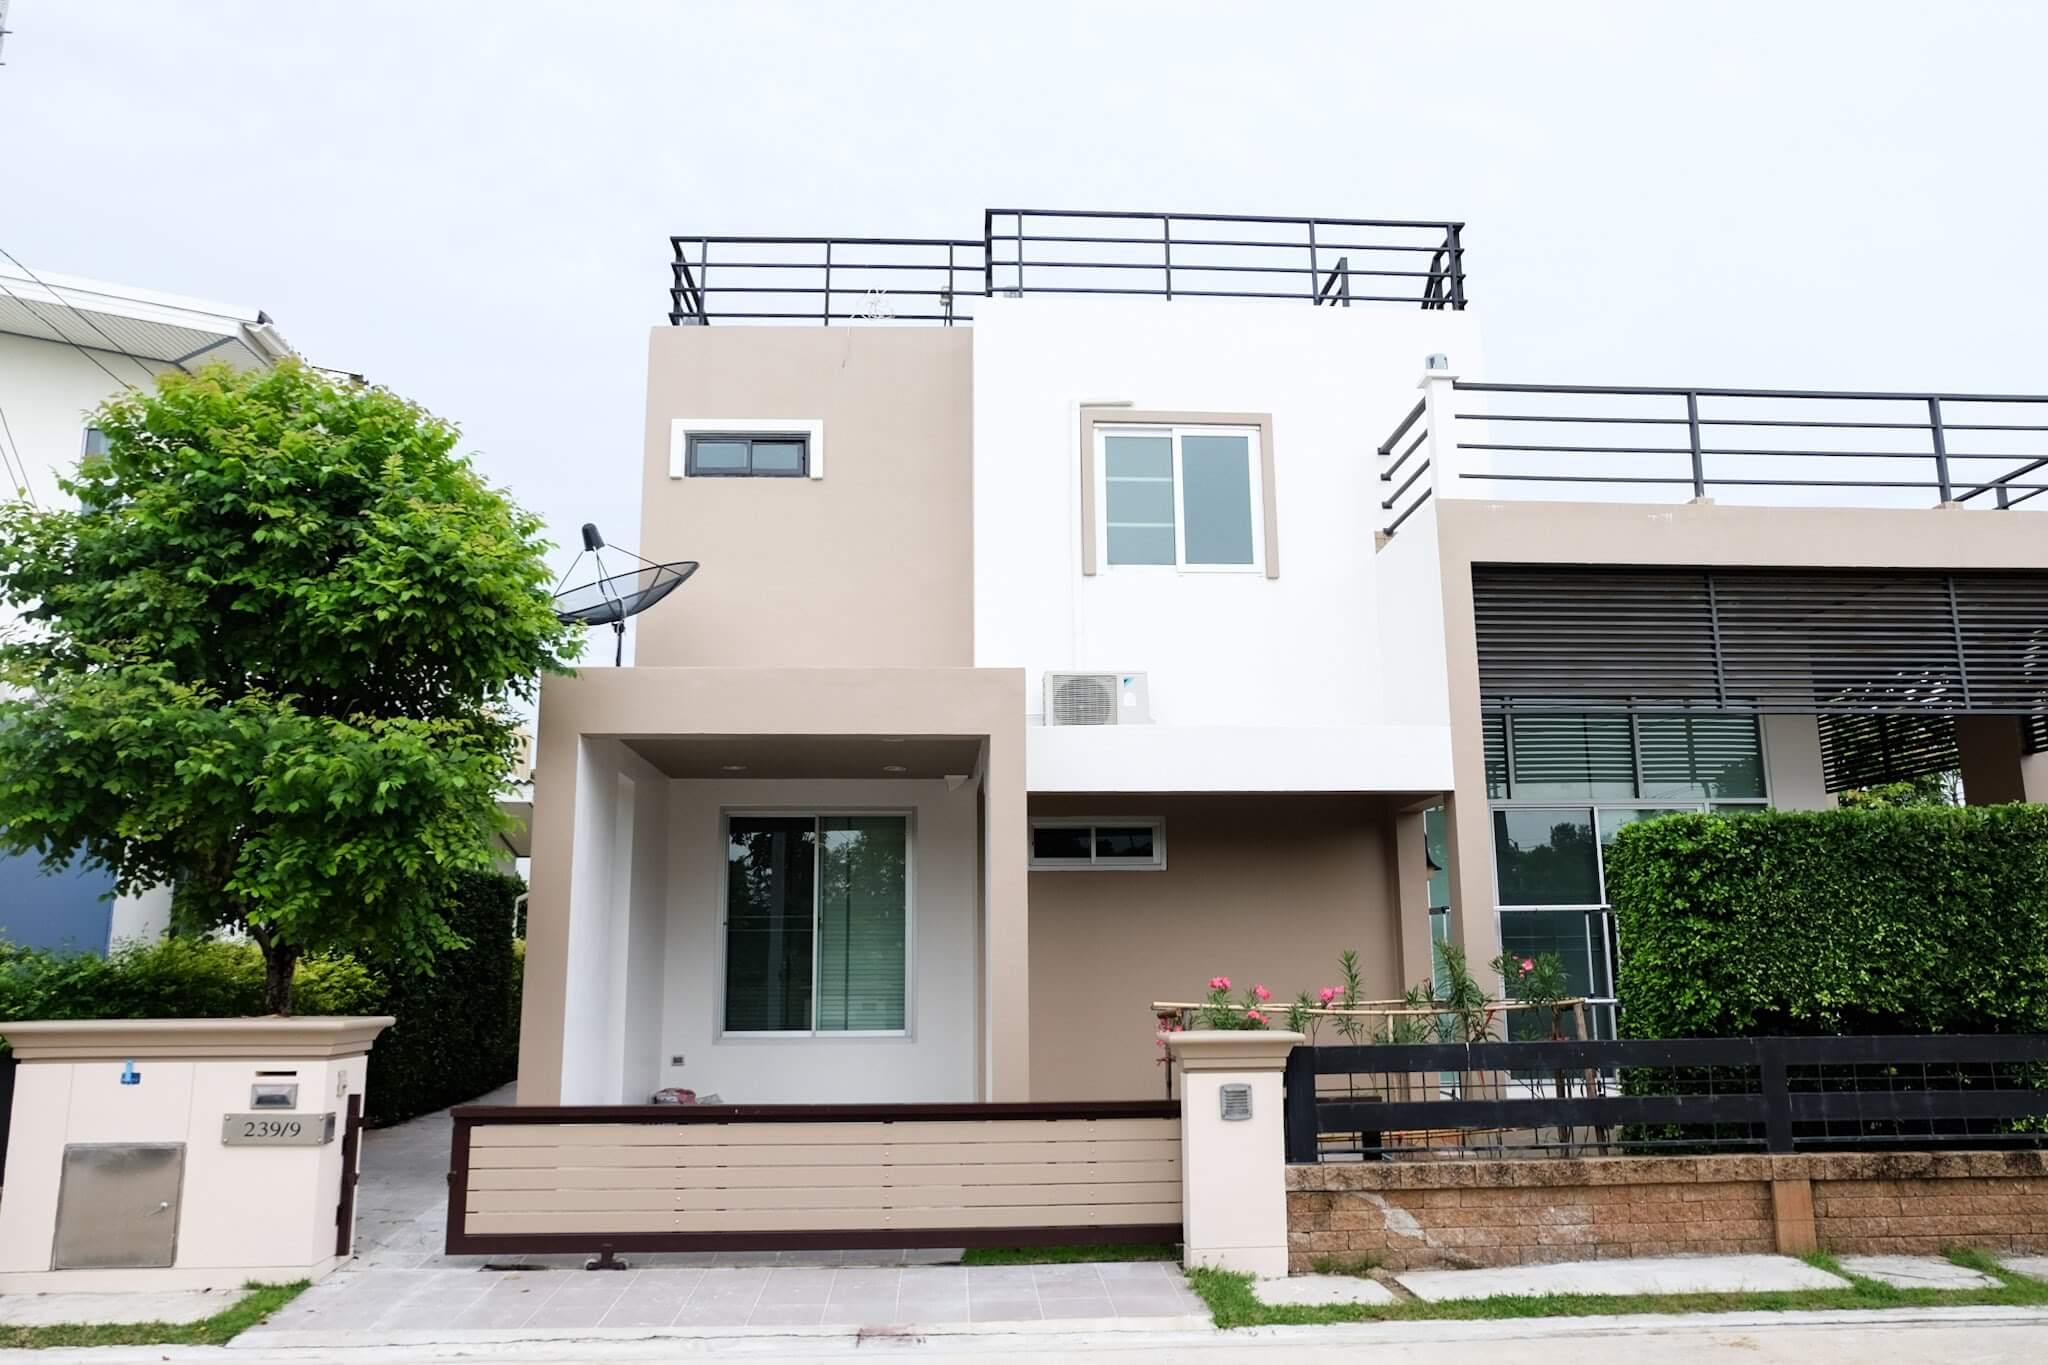 Tambon Taphong, Amphoe Mueang Rayong, Rayong, 3 Bedrooms Bedrooms, ,2 BathroomsBathrooms,Villa,For Rent,Casa Seaside,1,1004